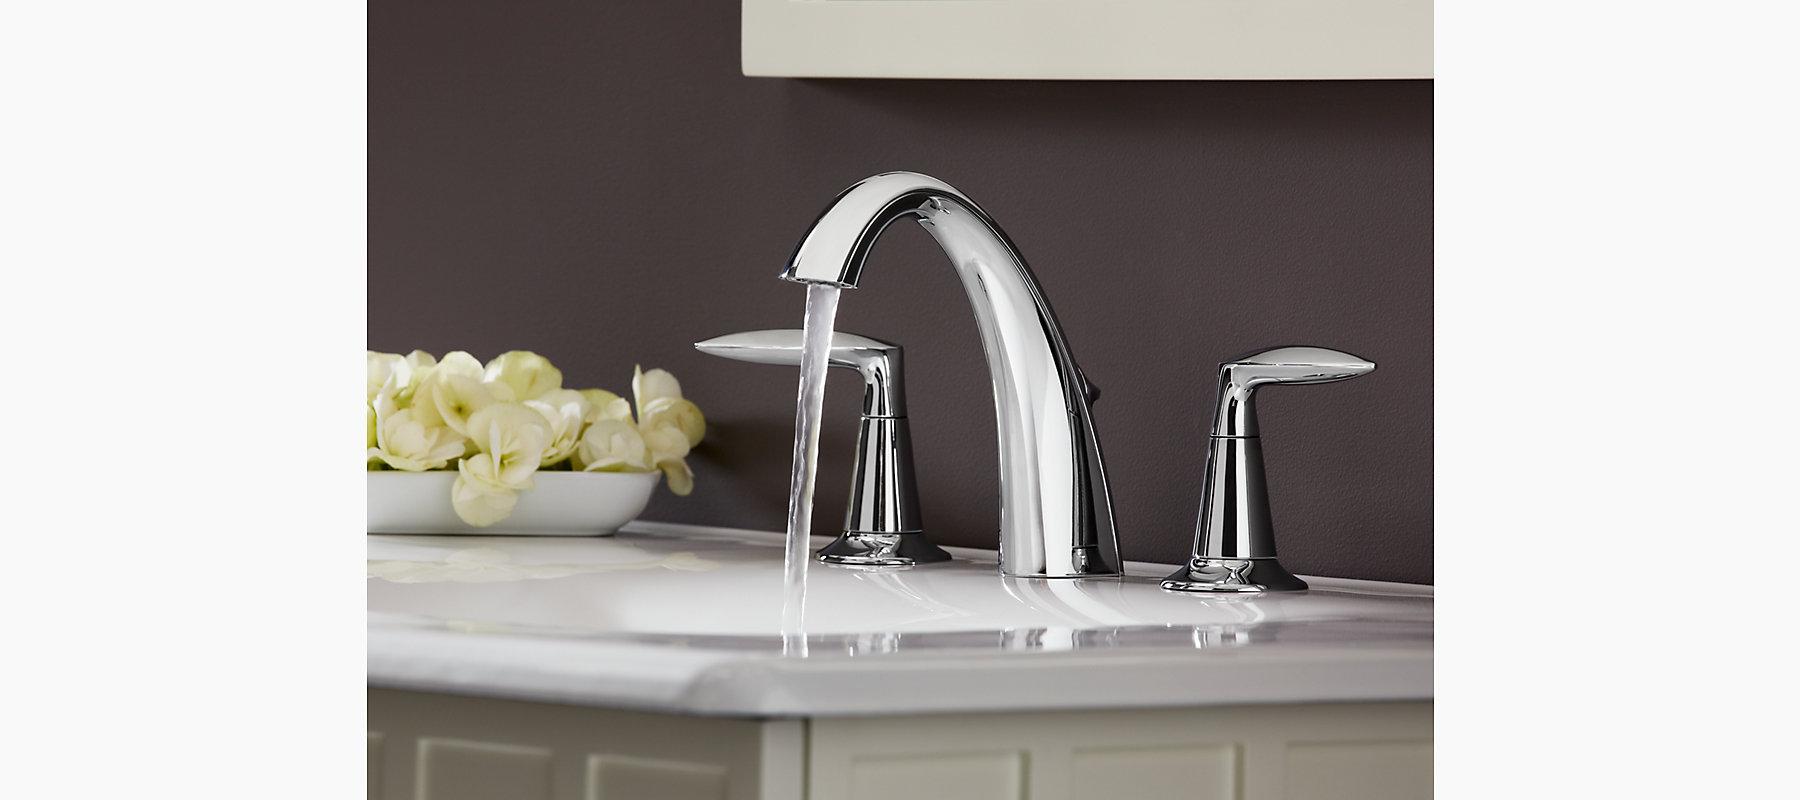 Alteo widespread bathroom sink faucet k 45102 4 kohler for Kohler alteo widespread bathroom faucet